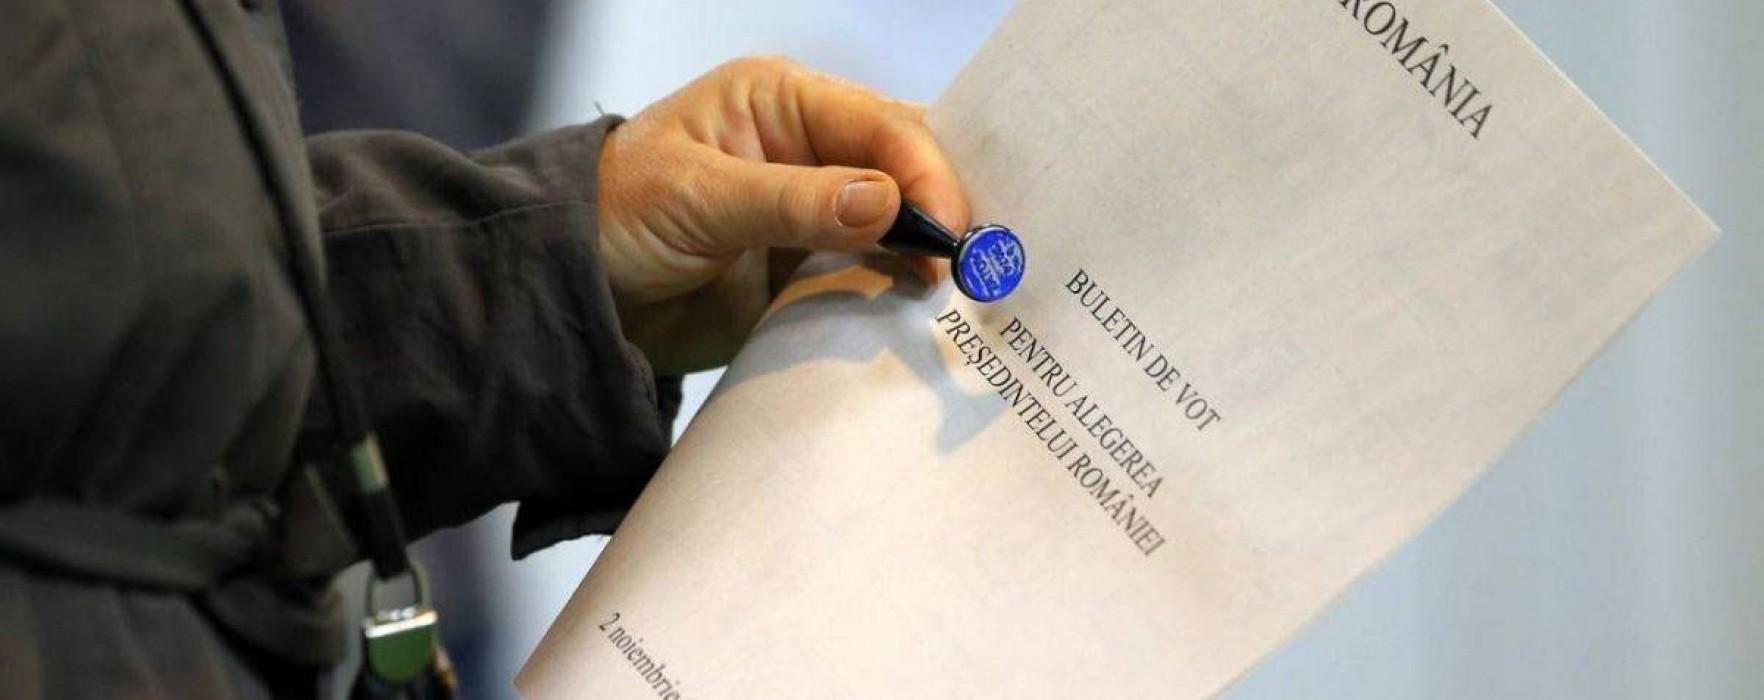 Dâmboviţa: Ponta – 52,54%, Iohannis – 23,78%, rezultat final anunţat de BEJ